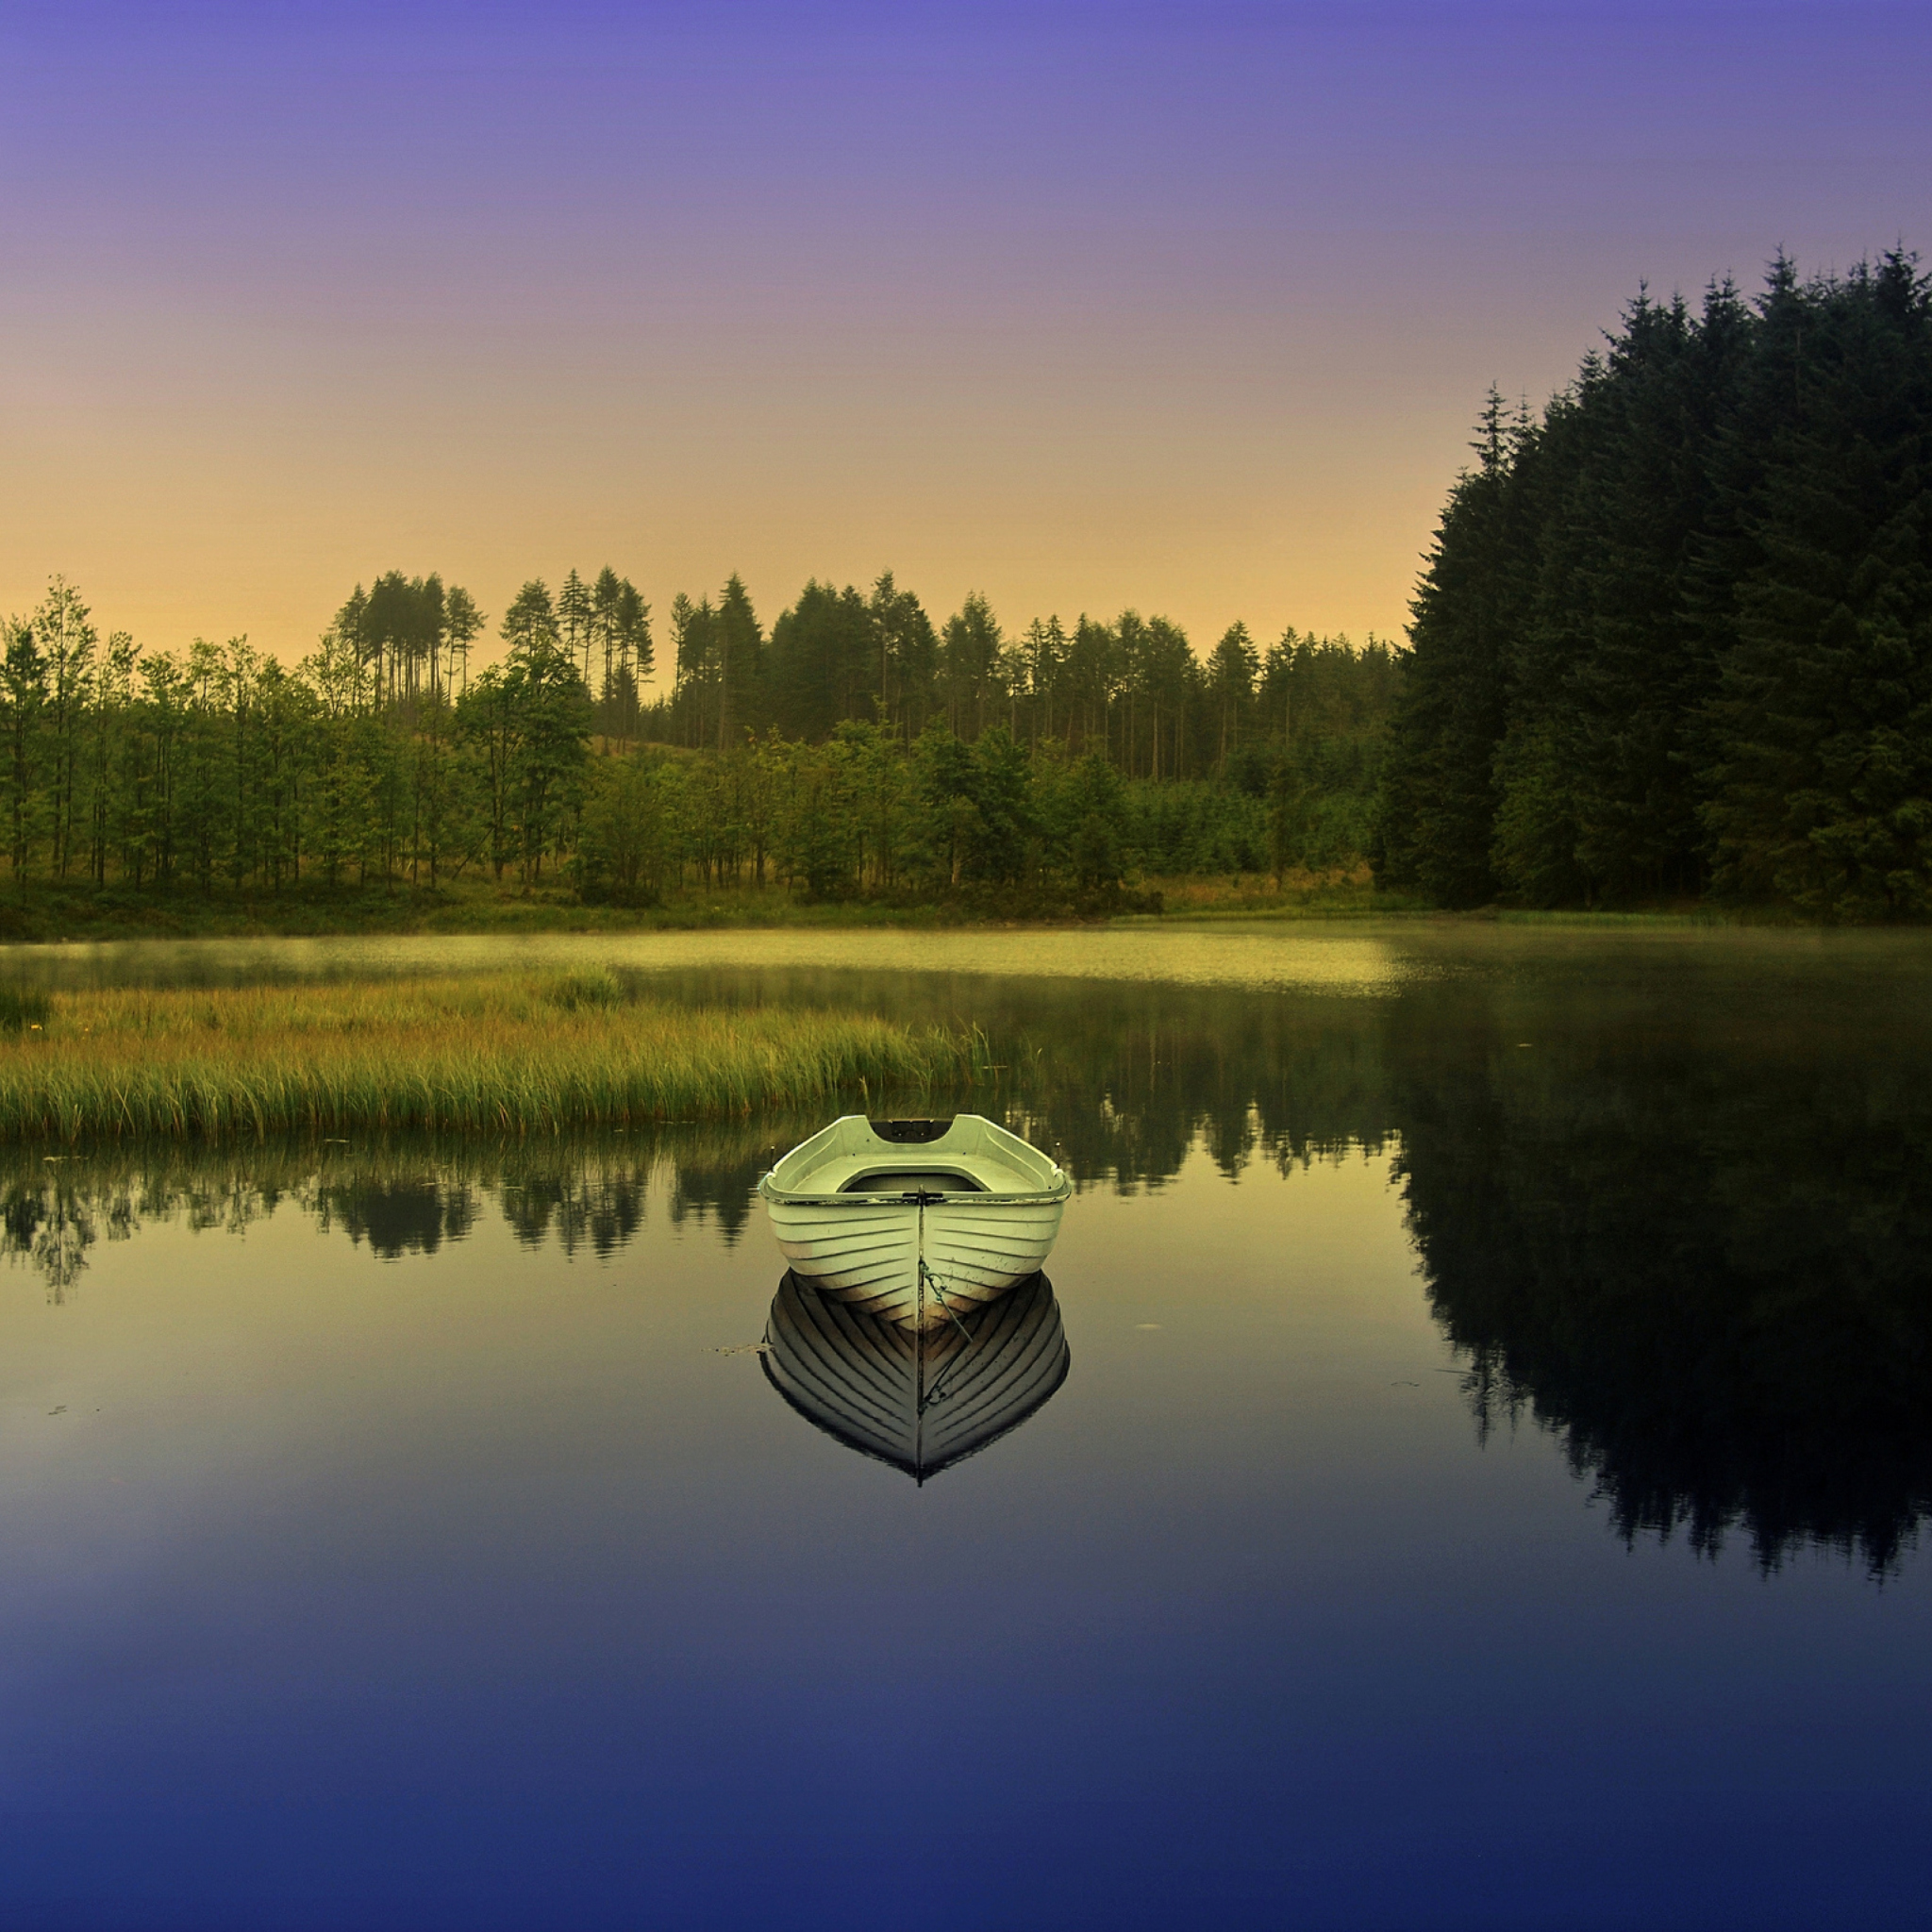 Лодка на берегу зеленого озера  № 2493041 бесплатно